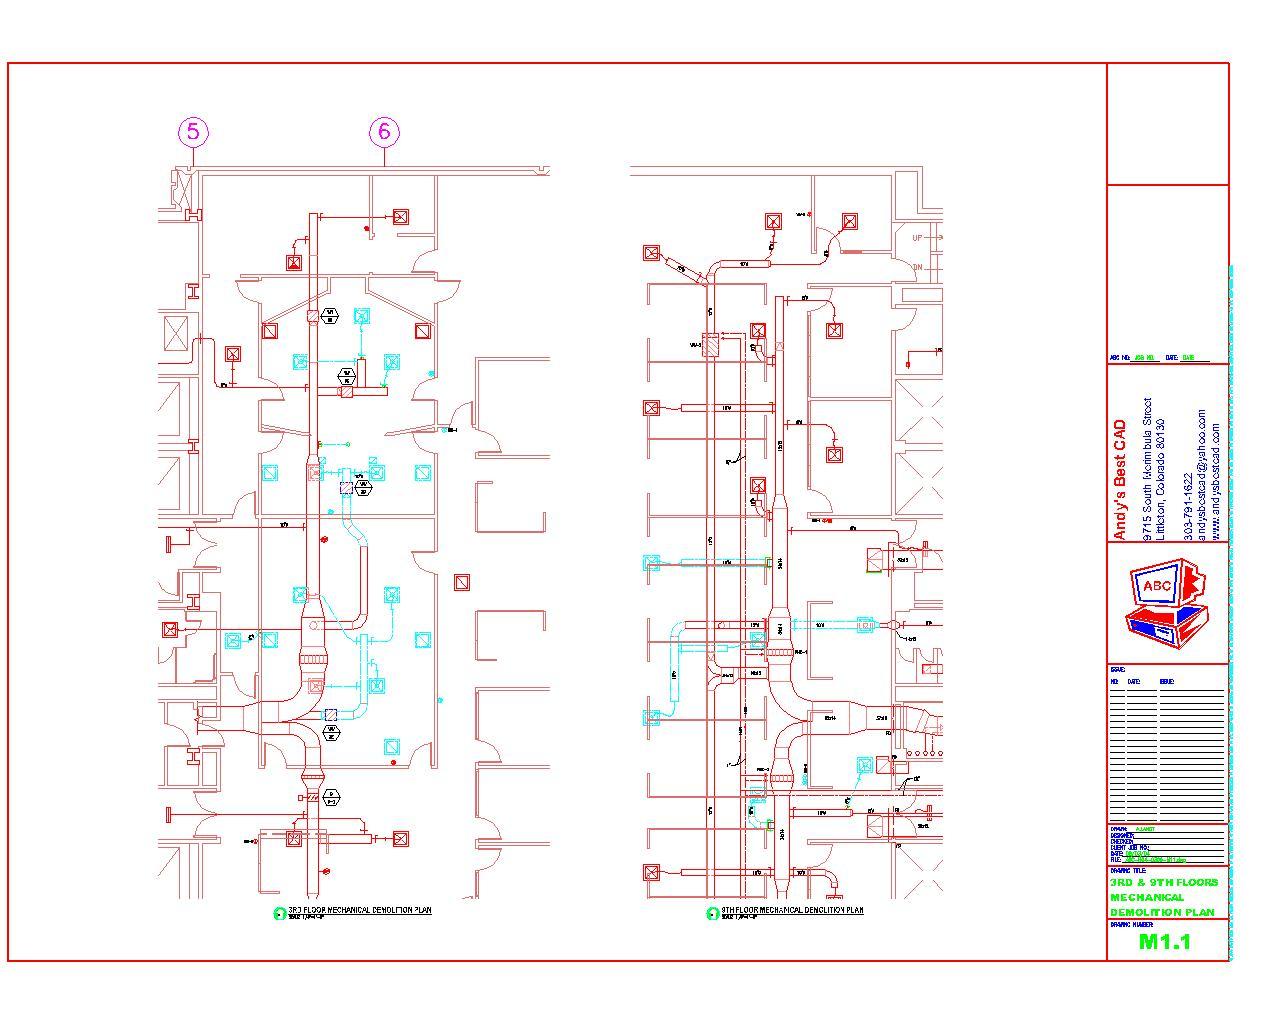 GG_8824] Hvac Drawing Sample Download Diagram | Hvac Drawing Samples |  | Anist Geis Onom Ginia Sulf Proe Waro Sputa Jebrp Faun Attr Benkeme  Mohammedshrine Librar Wiring 101